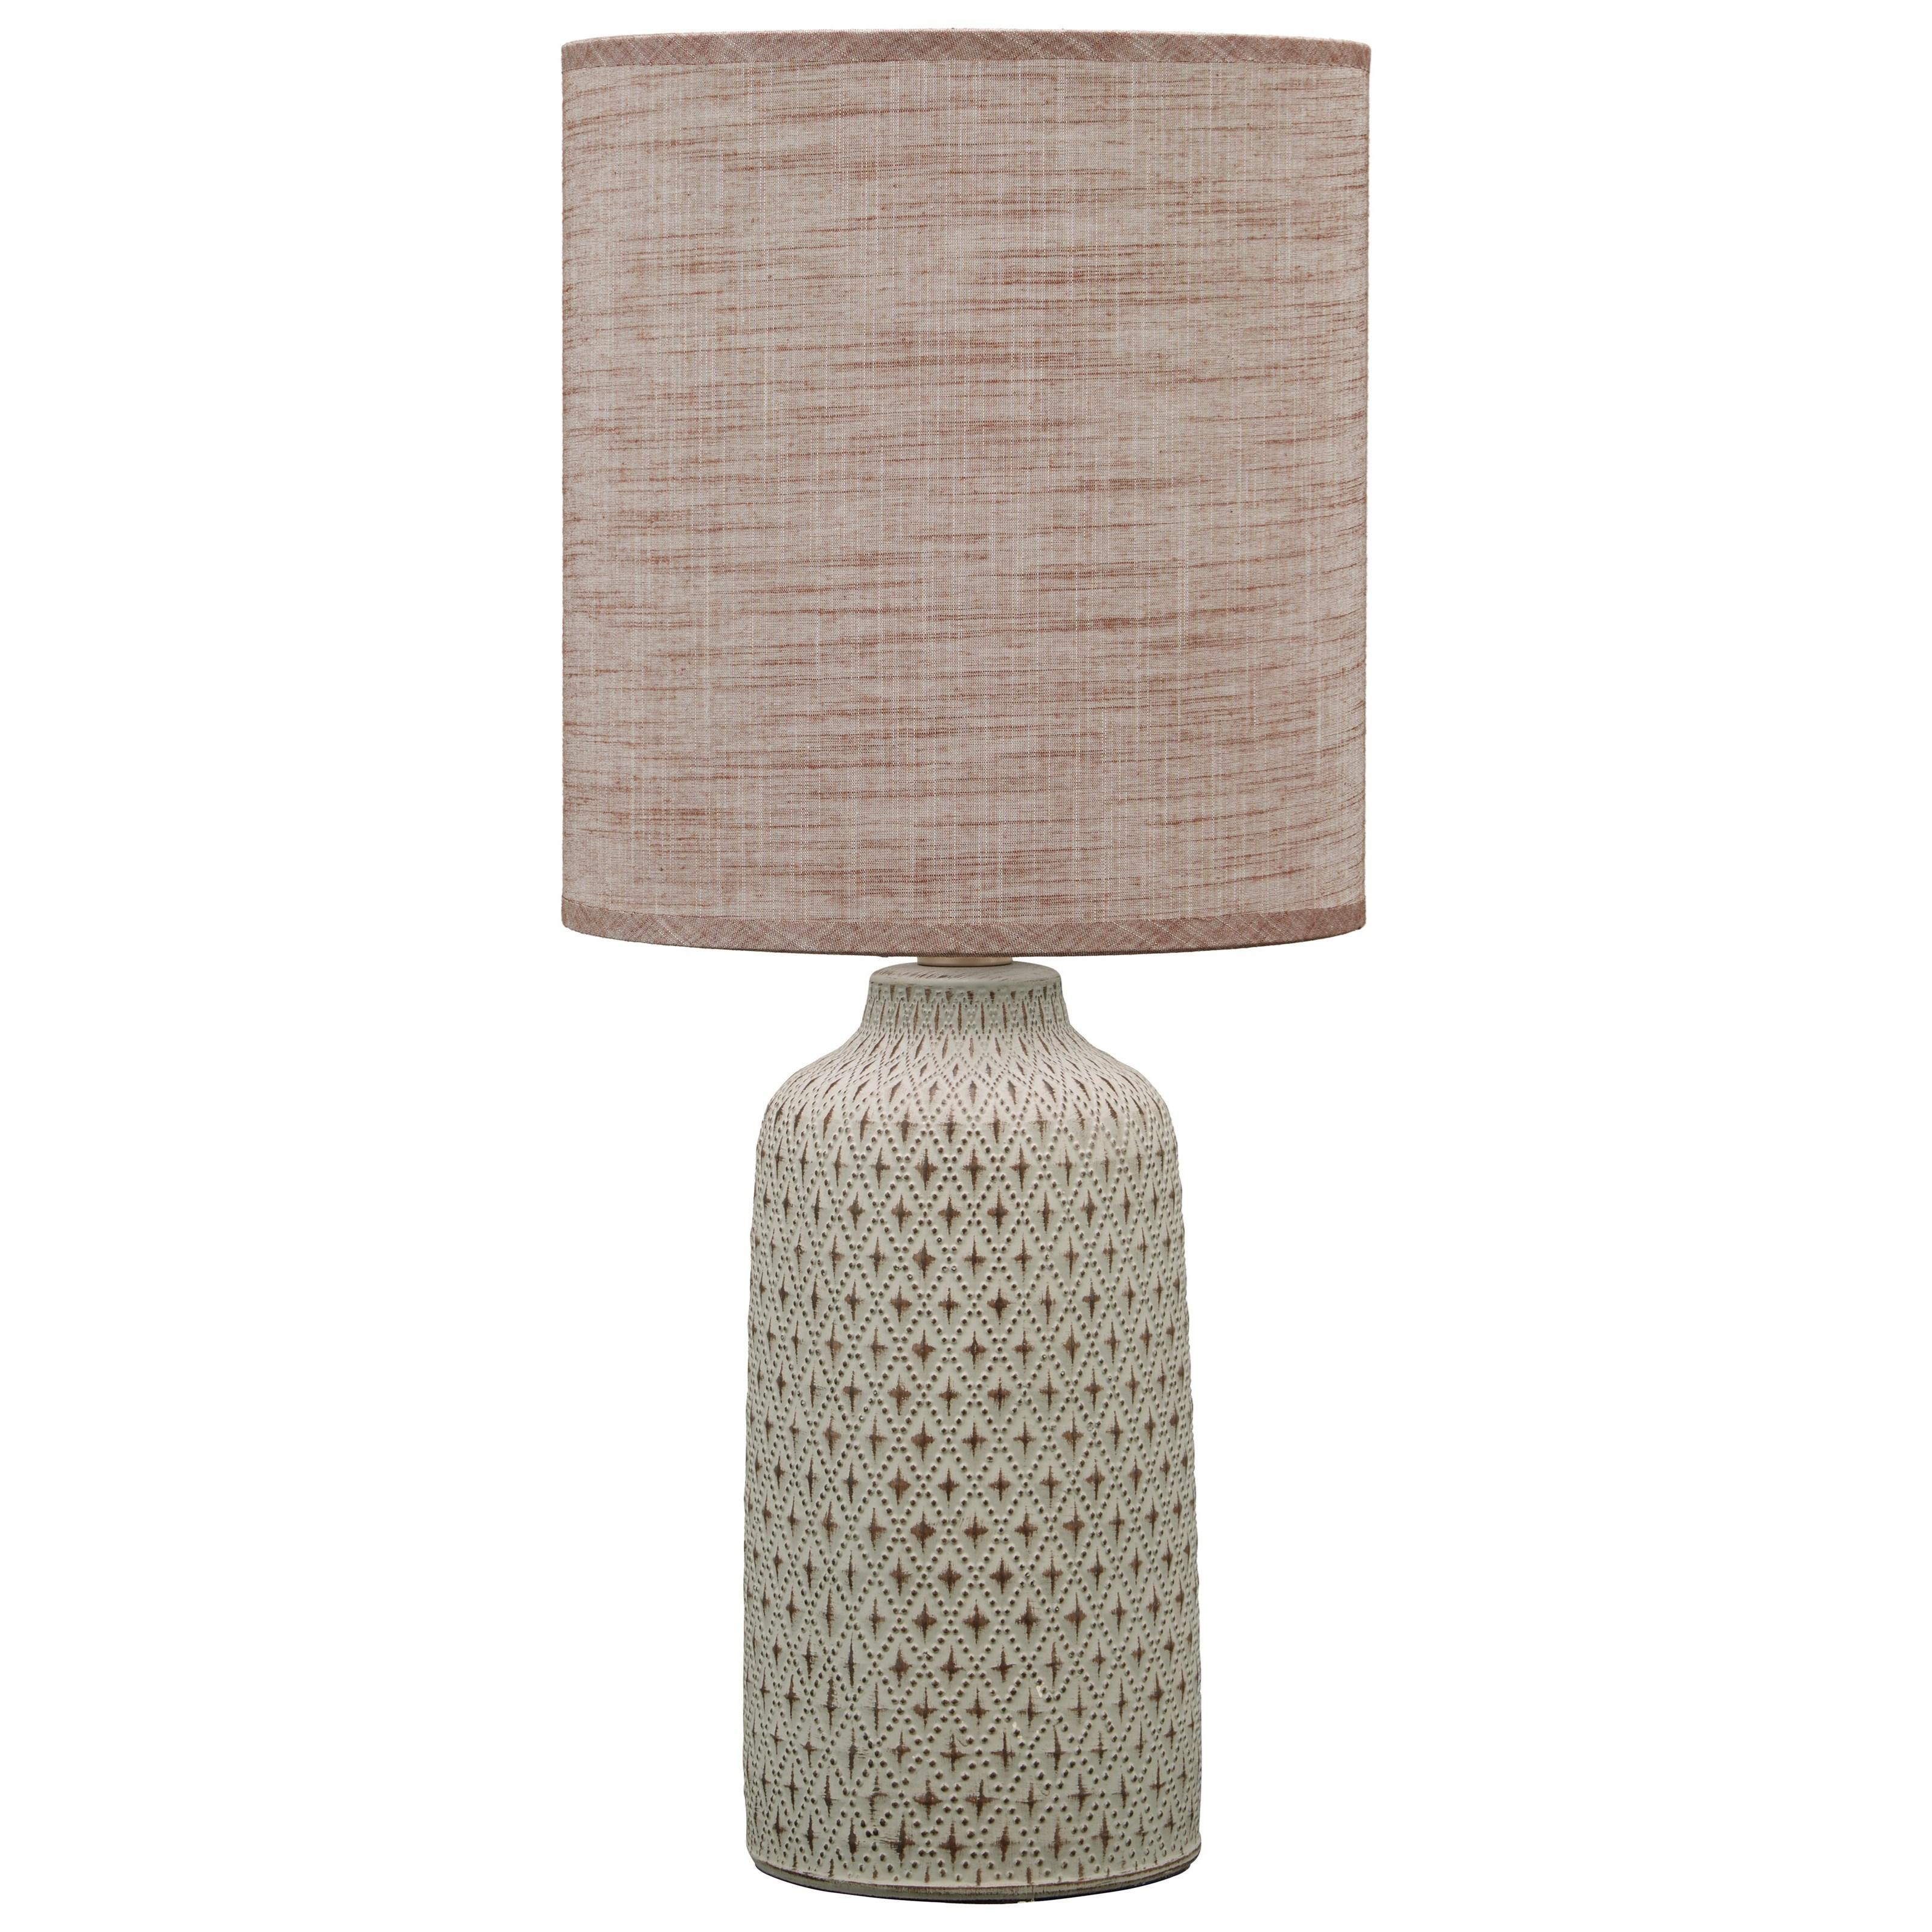 Donnford Brown Ceramic Table Lamp